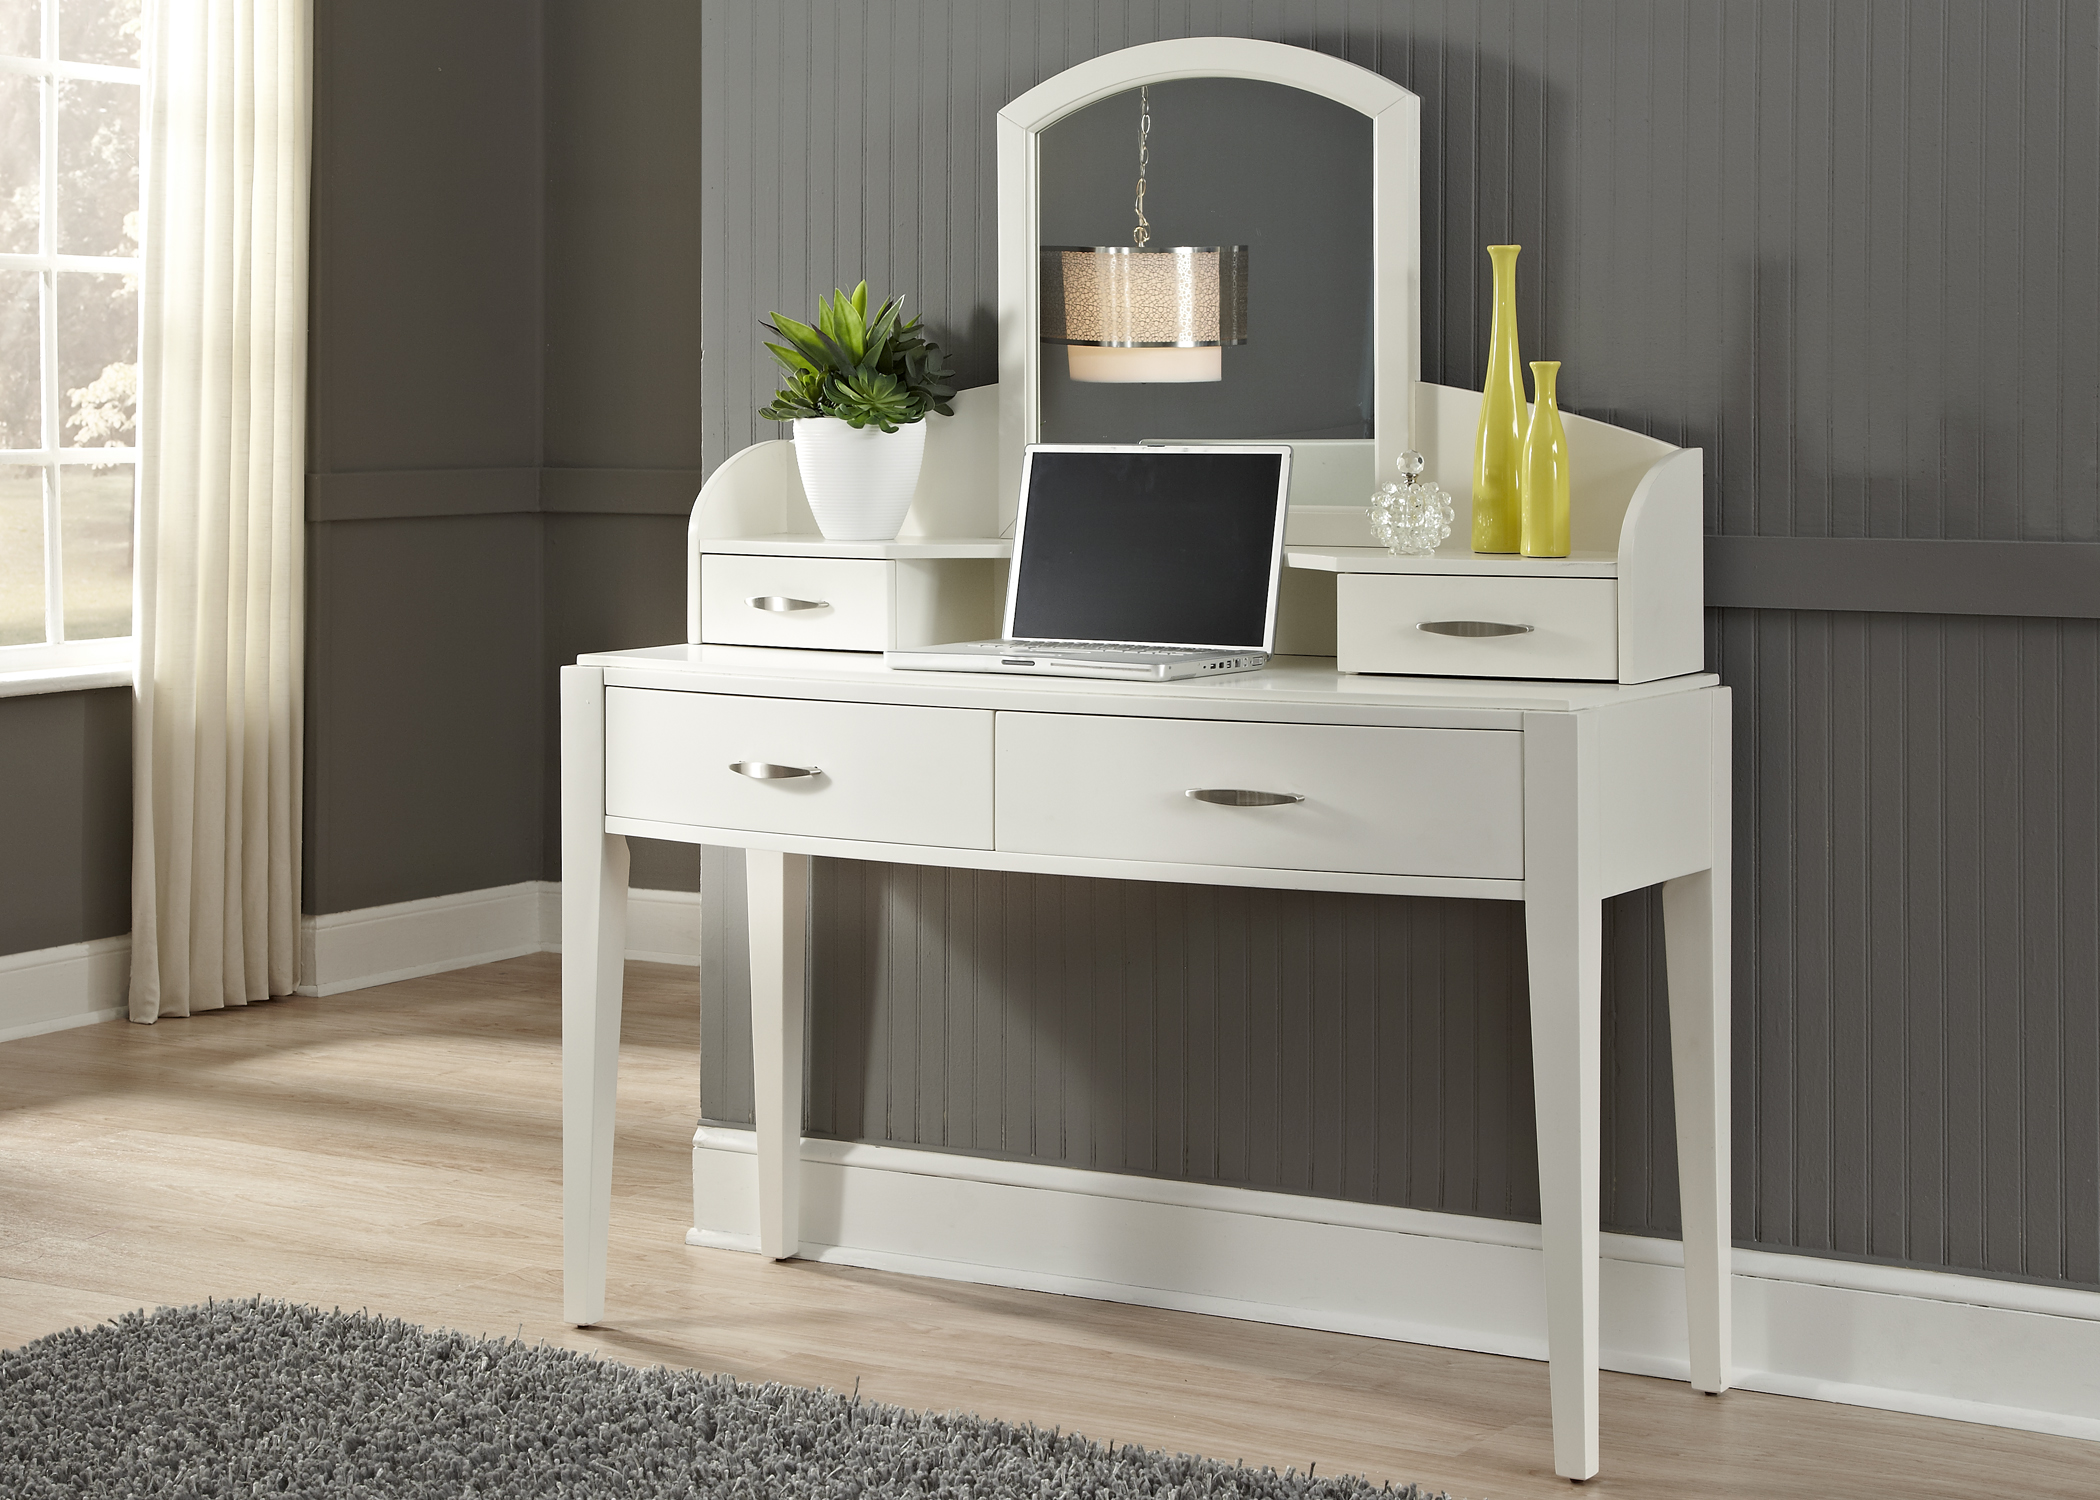 Model: 205-BR70B | Liberty Furniture Desk/Vanity